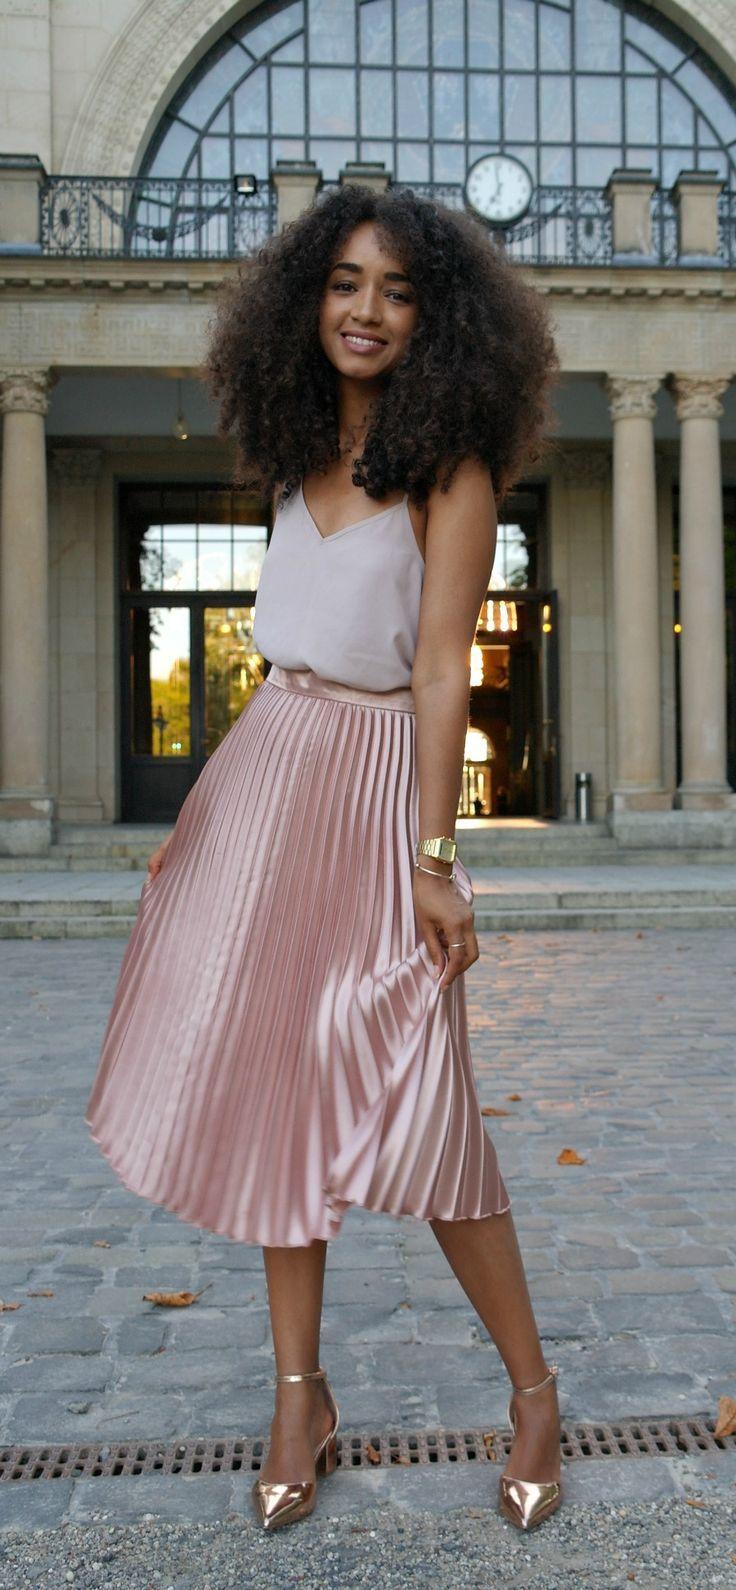 Damen Mode Outfit Streetstyle midirock pleated skirt ...